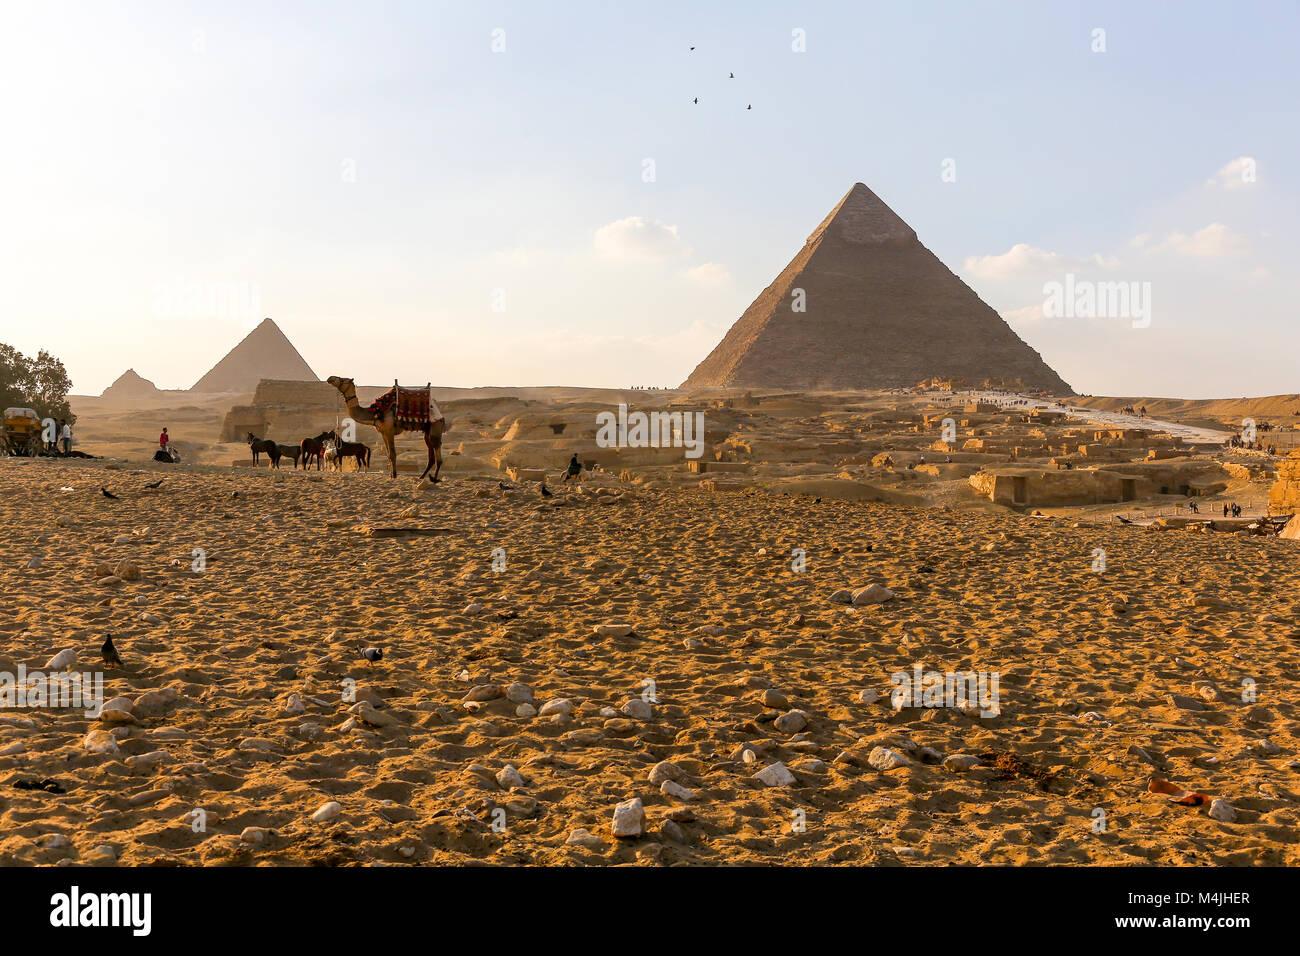 pyramids-giza-egypt-north-africa-M4JHER.jpg